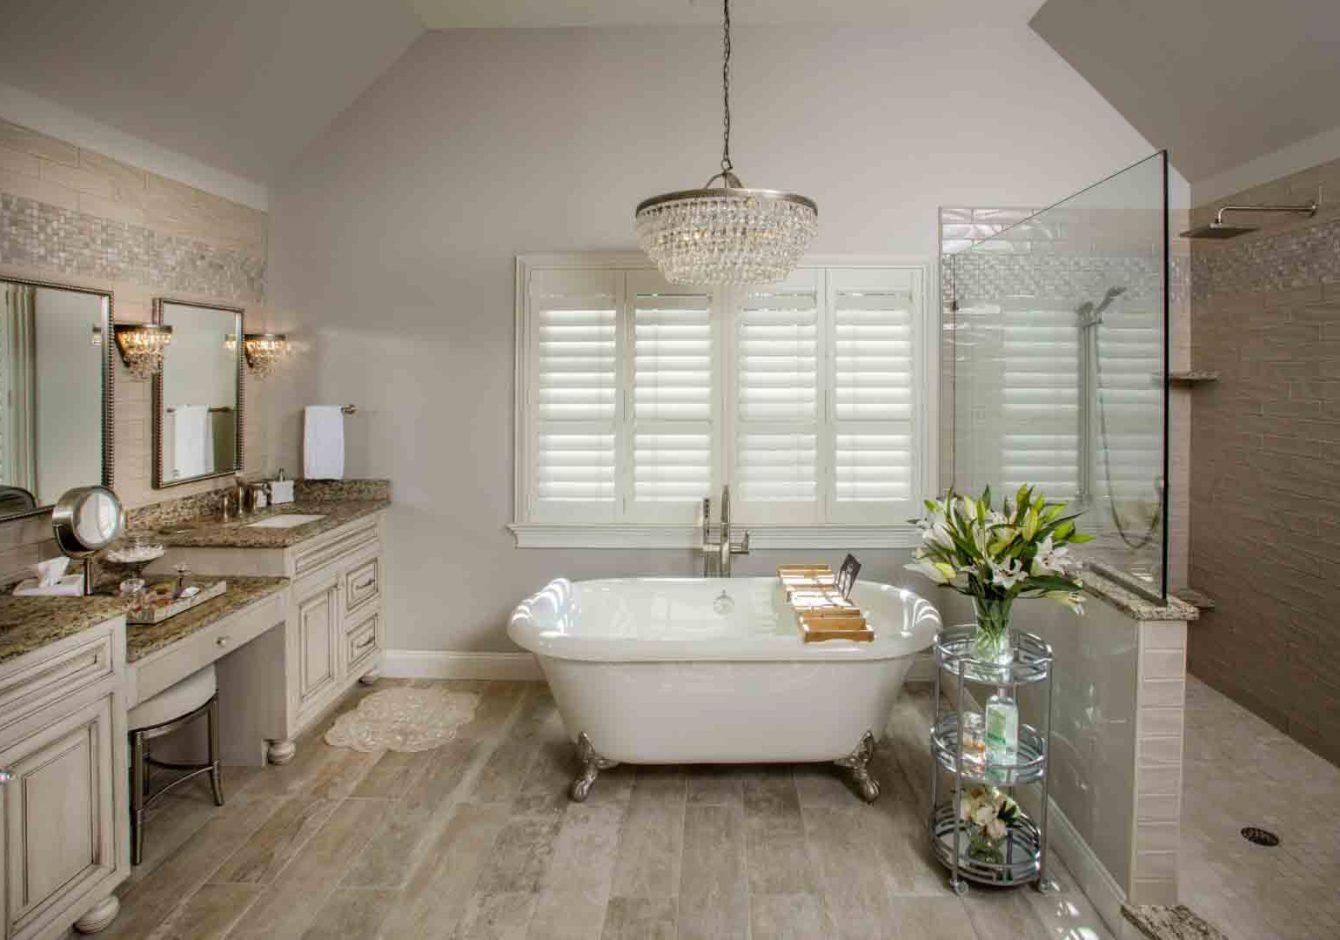 """Sparkling Serenity""- Doylestown Master Bathroom Renovation"